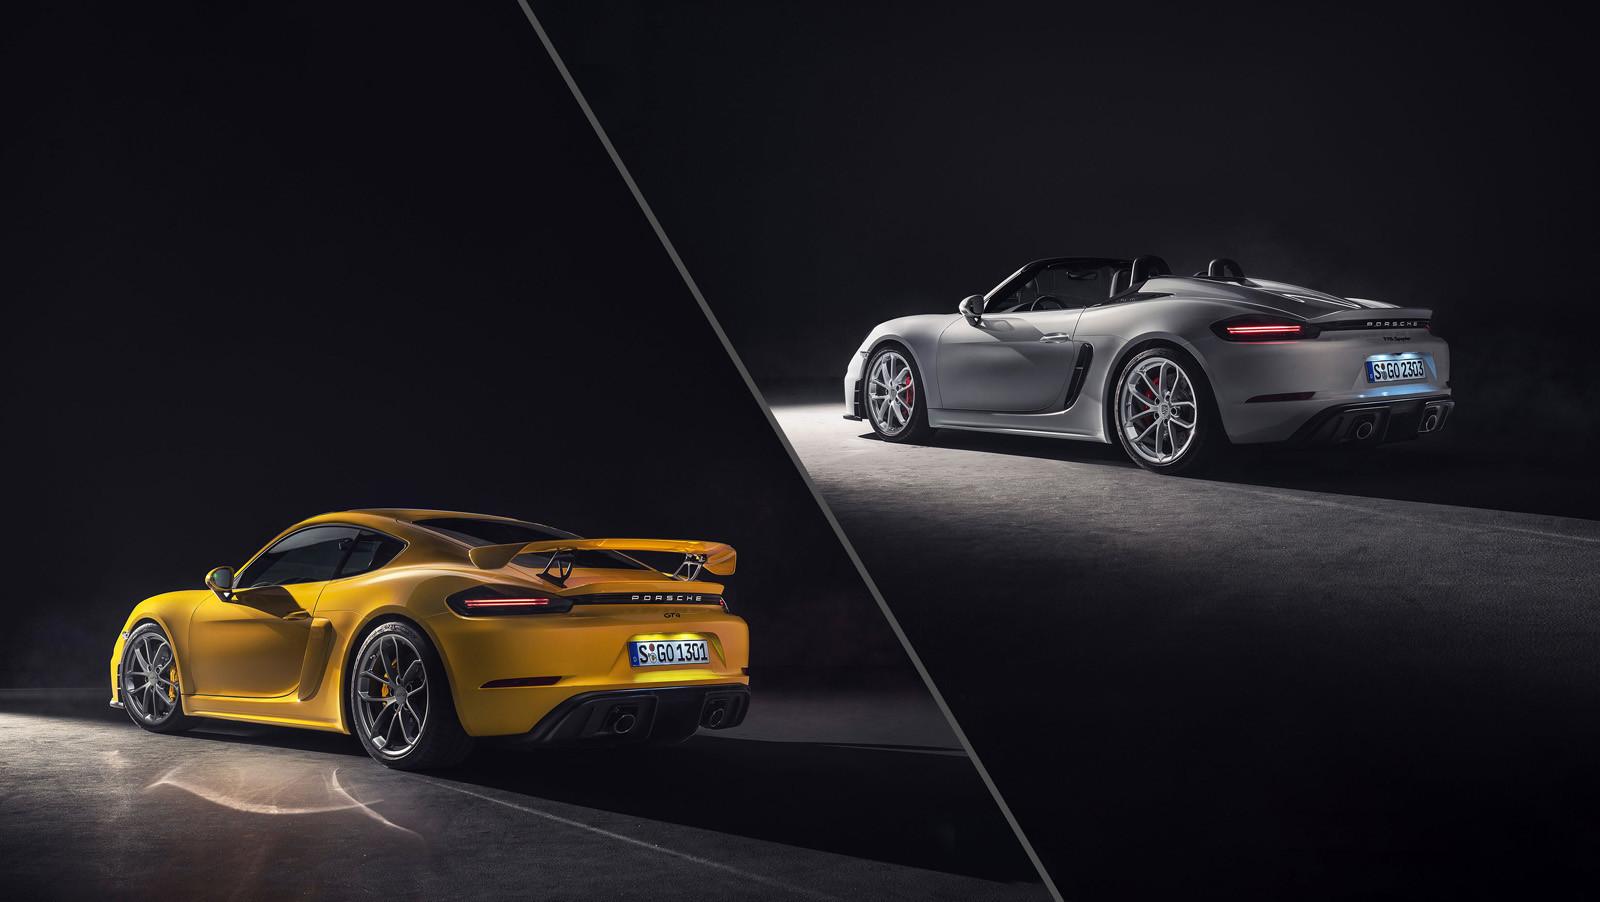 Foto de Porsche 718 Cayman GT4 y Porsche 718 Spyder (15/16)